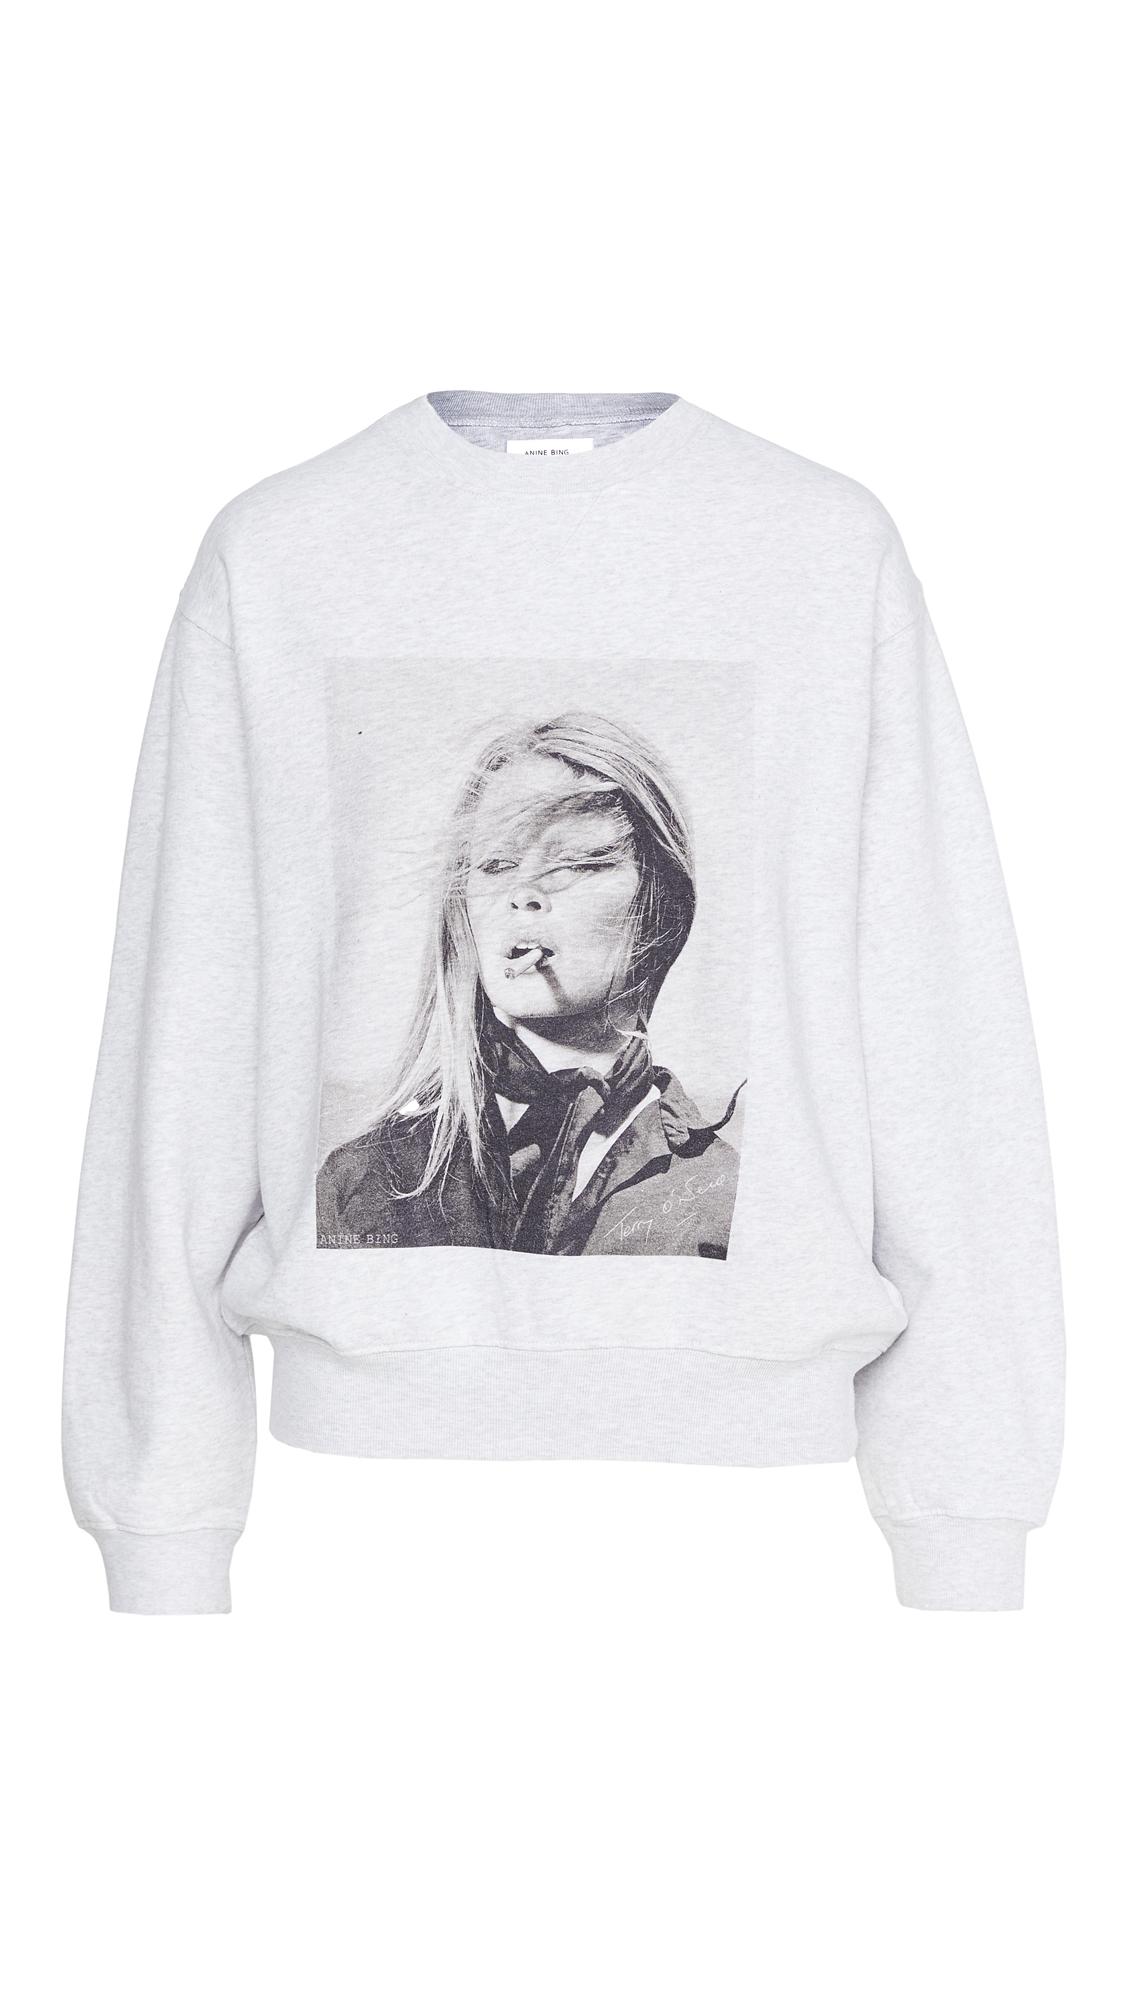 ANINE BING Ramona Sweatshirt Anine Bing x Terry O'Niell